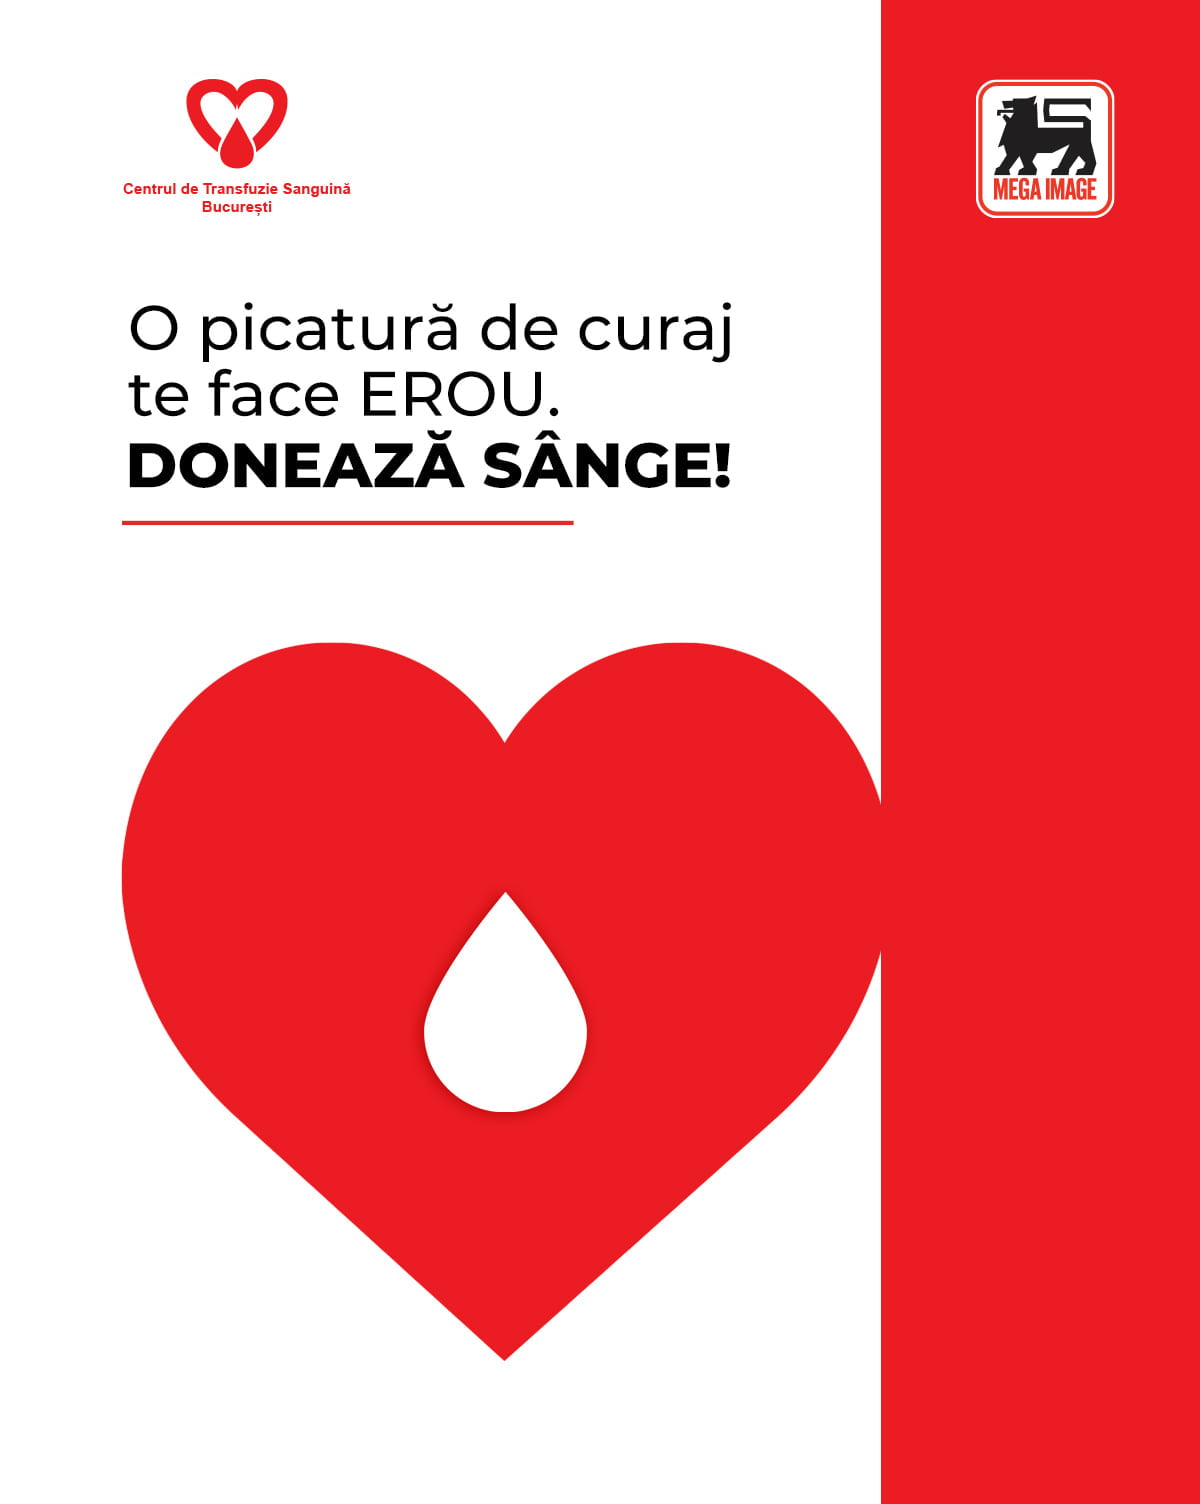 mega image pachete donare sange 07.04.2021